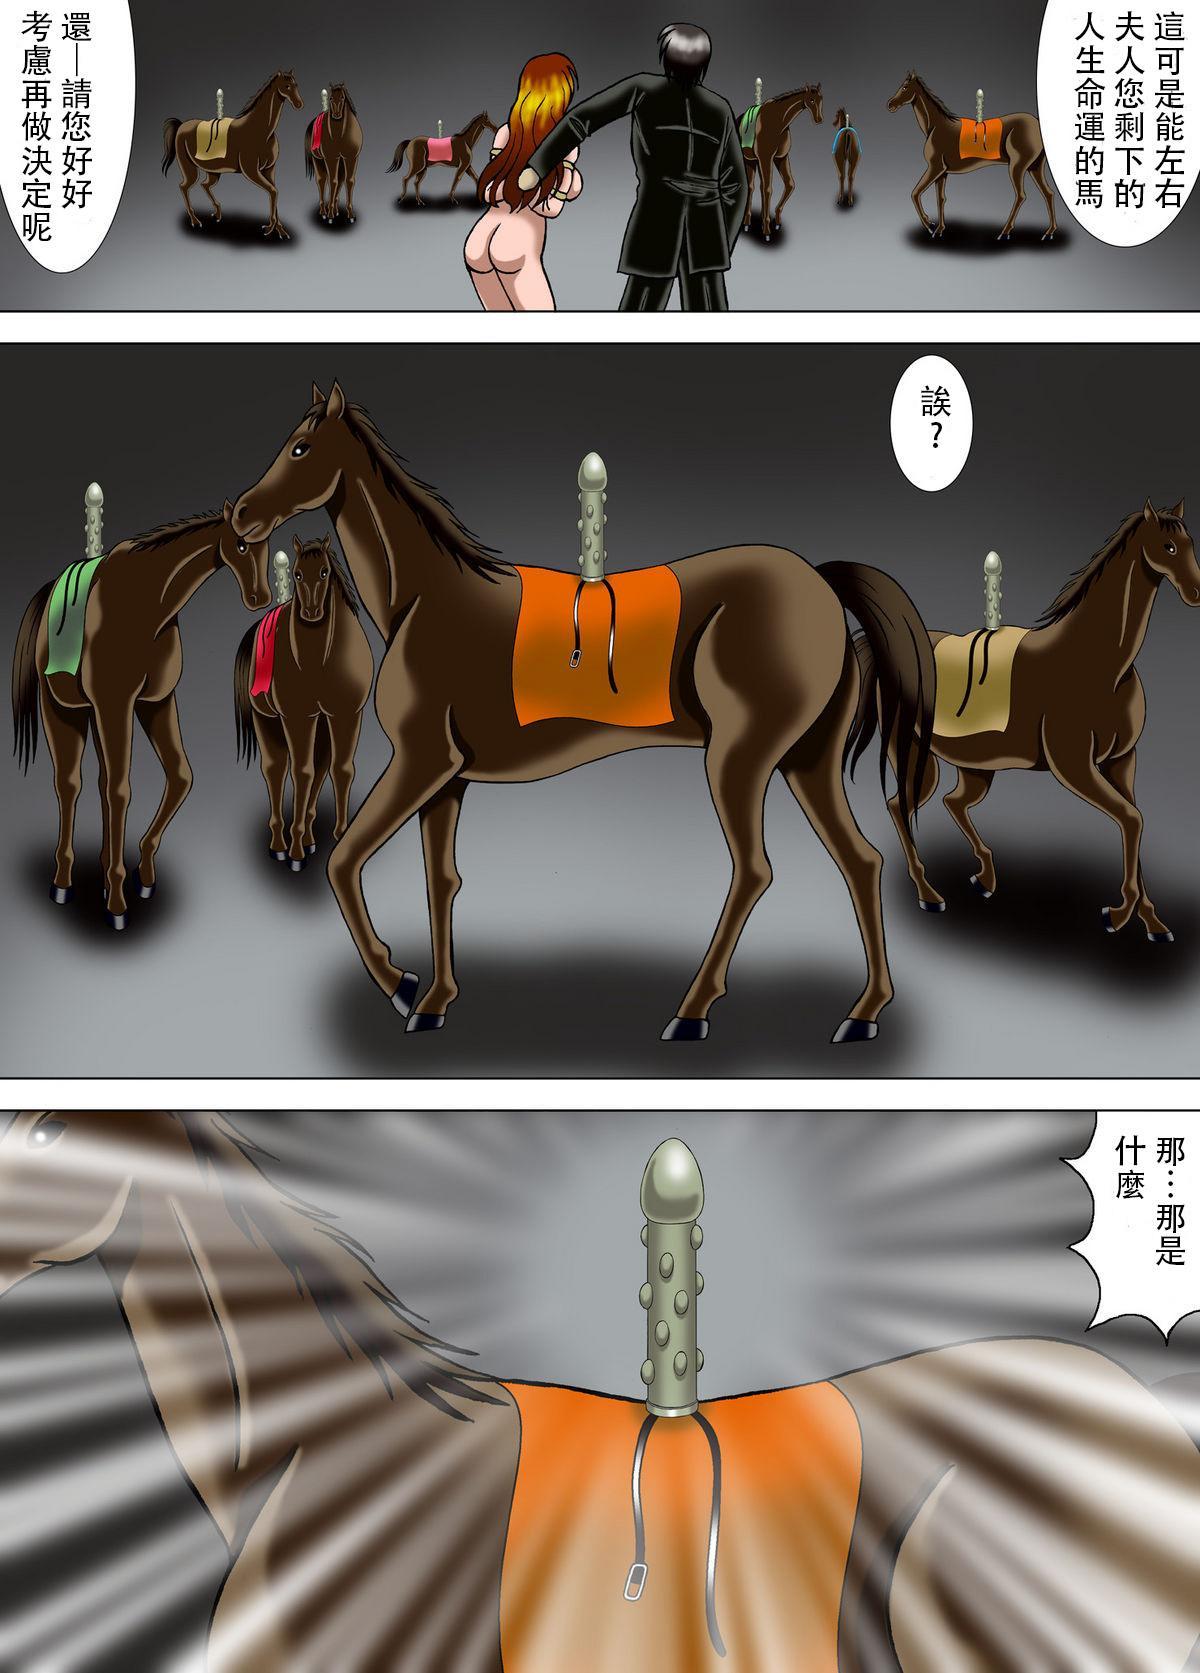 Bajoku Fujin 6